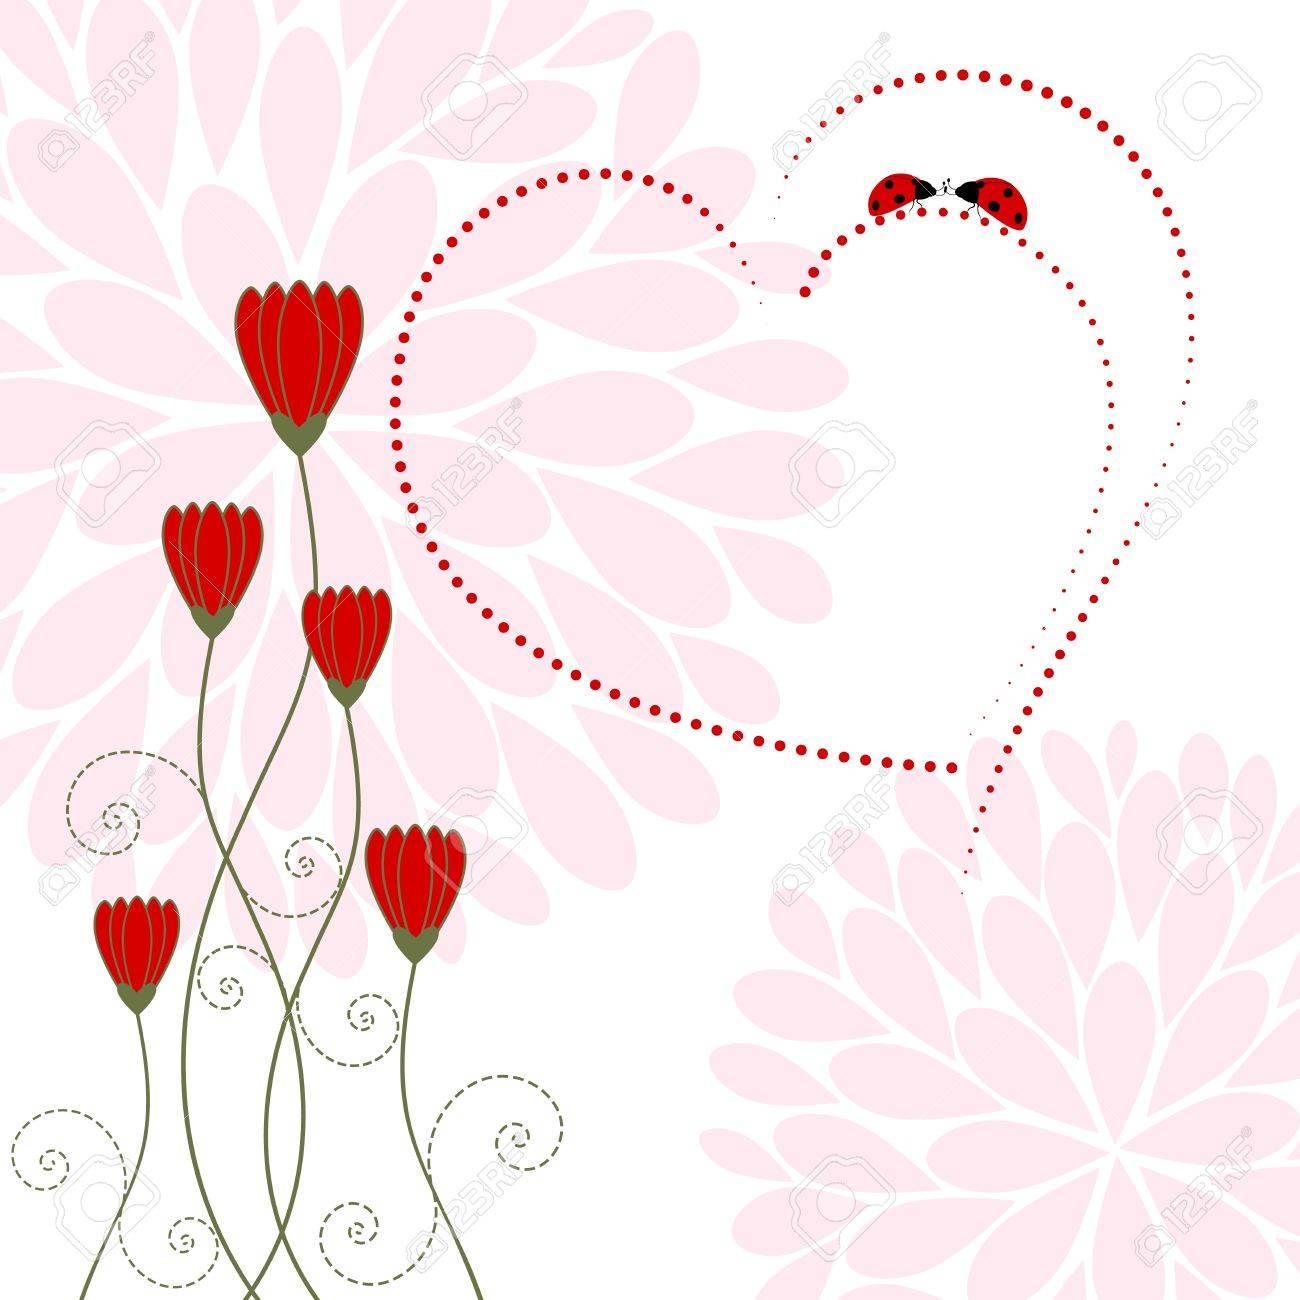 Springtime Love Card with Flower and Ladybug Stock Vector - 17271947